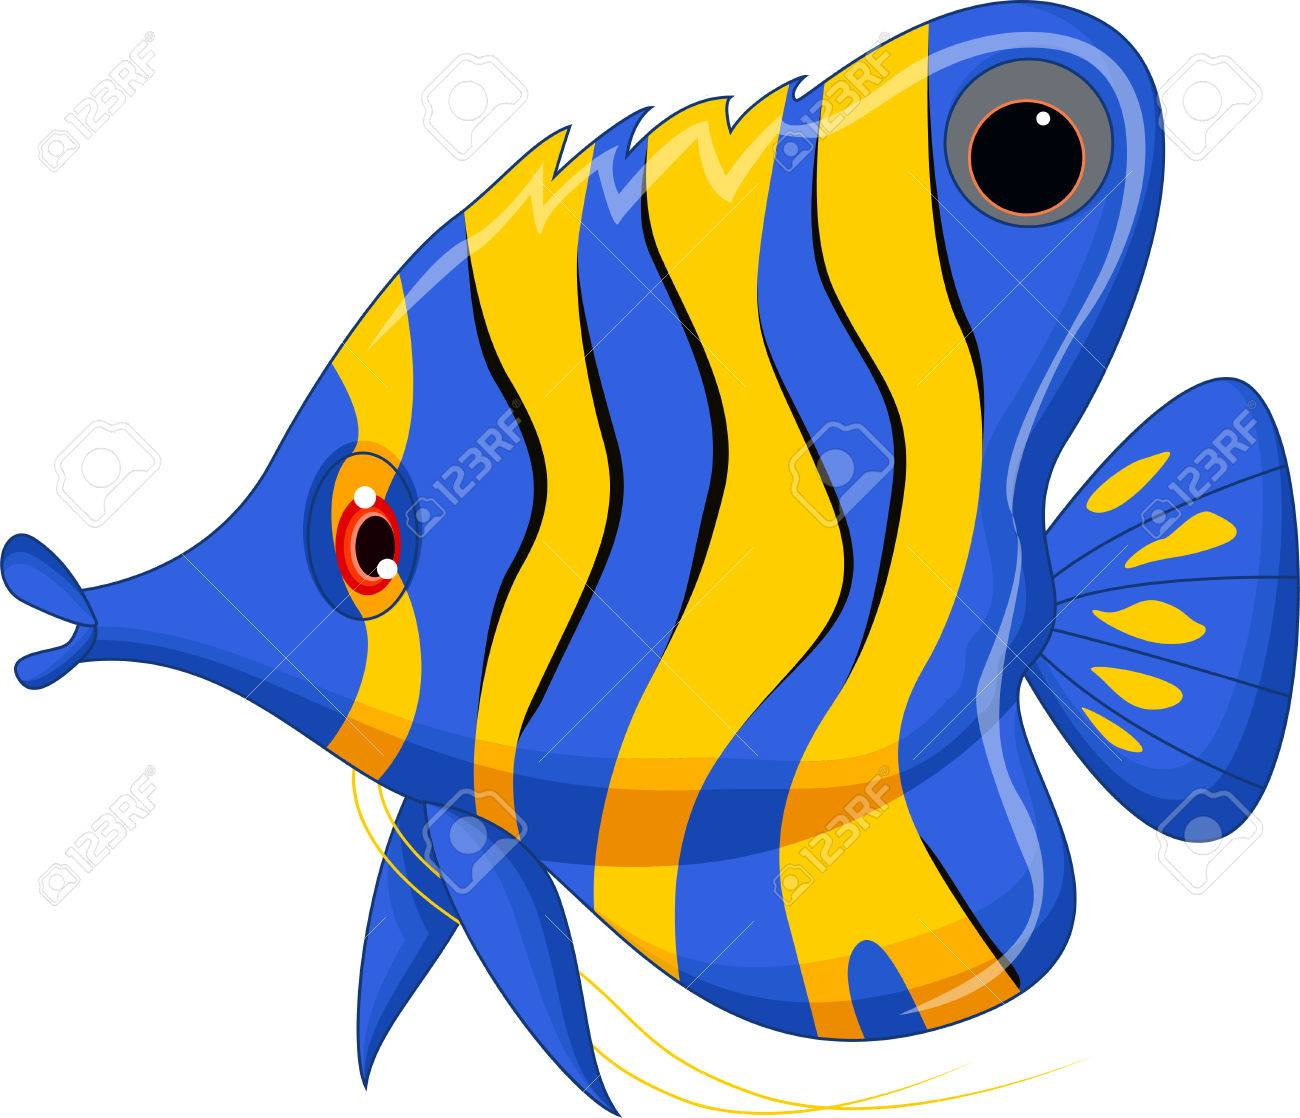 Uncategorized Cartoon Angel Fish cute cartoon angel fish royalty free cliparts vectors and stock vector 38015203